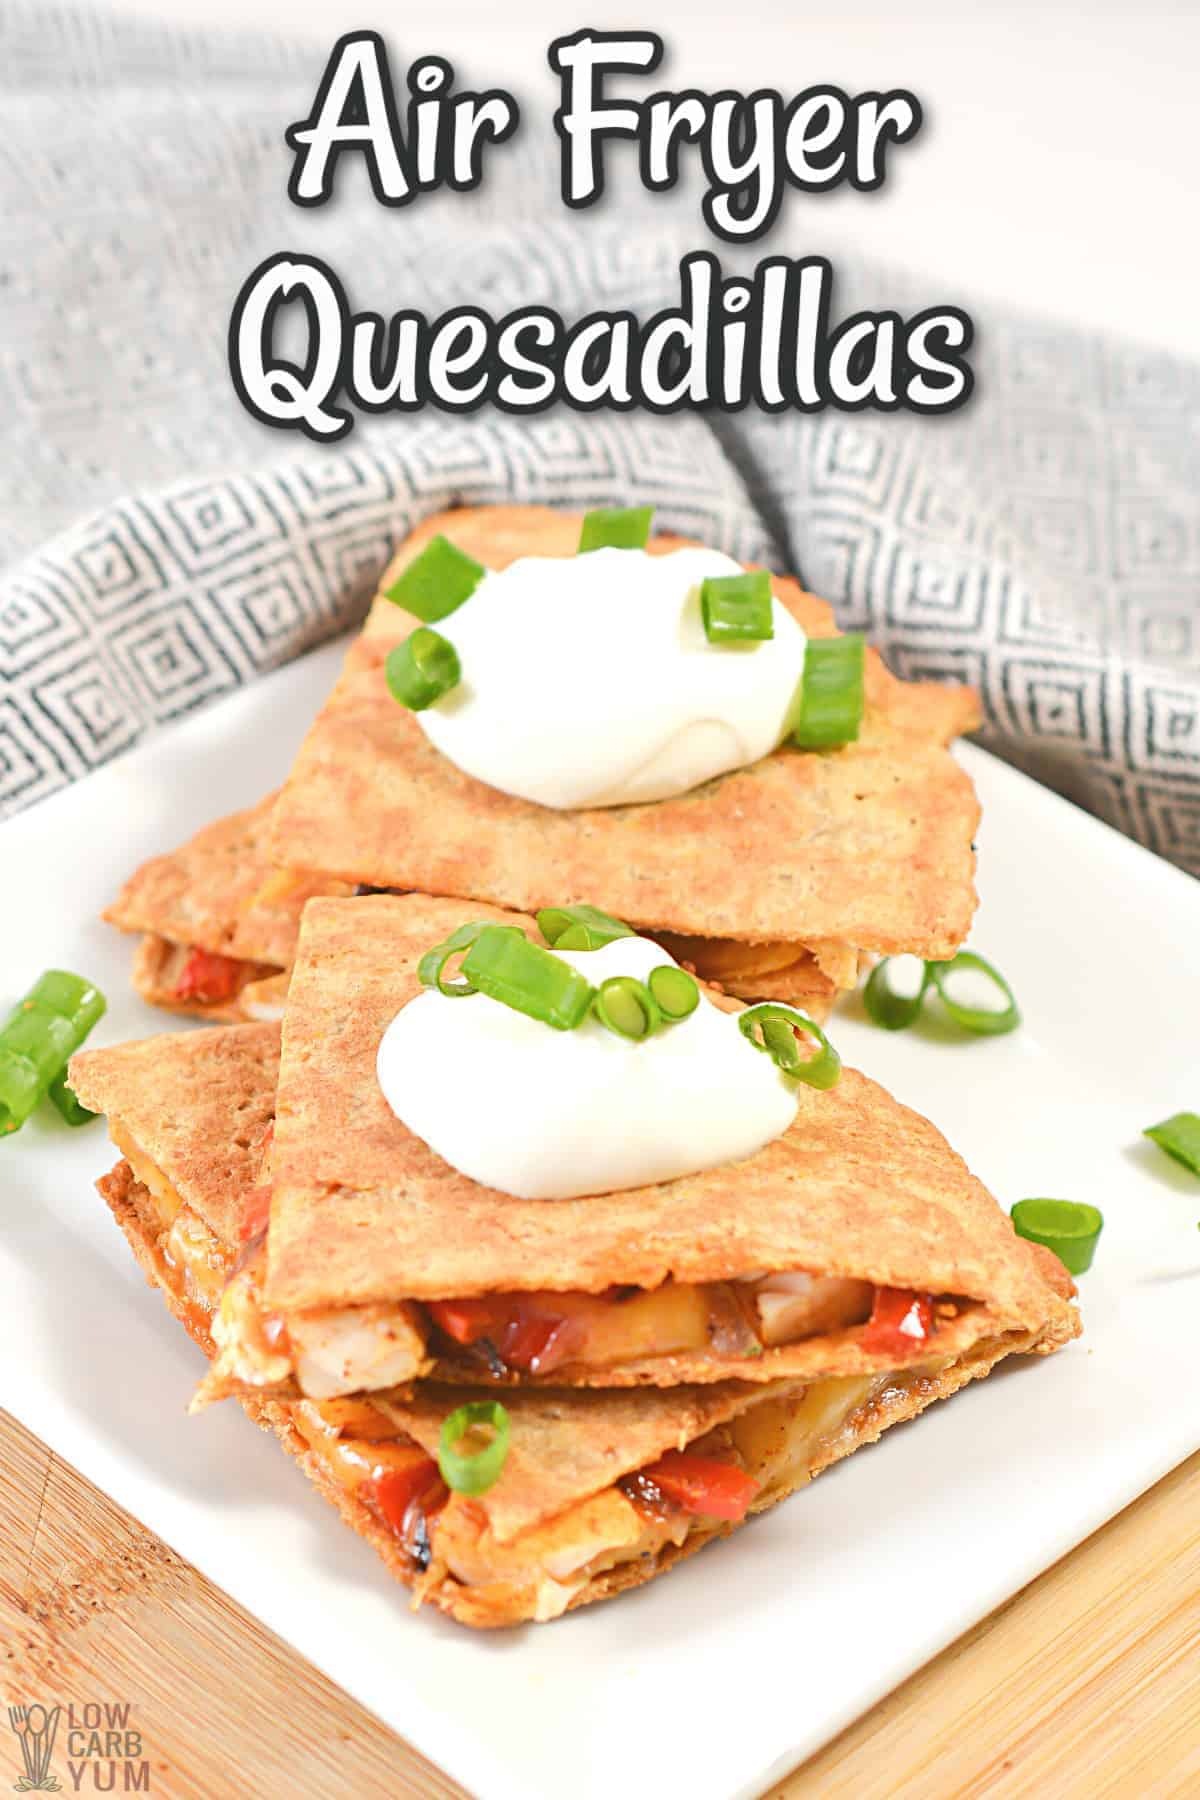 air fryer quesadillas cover image